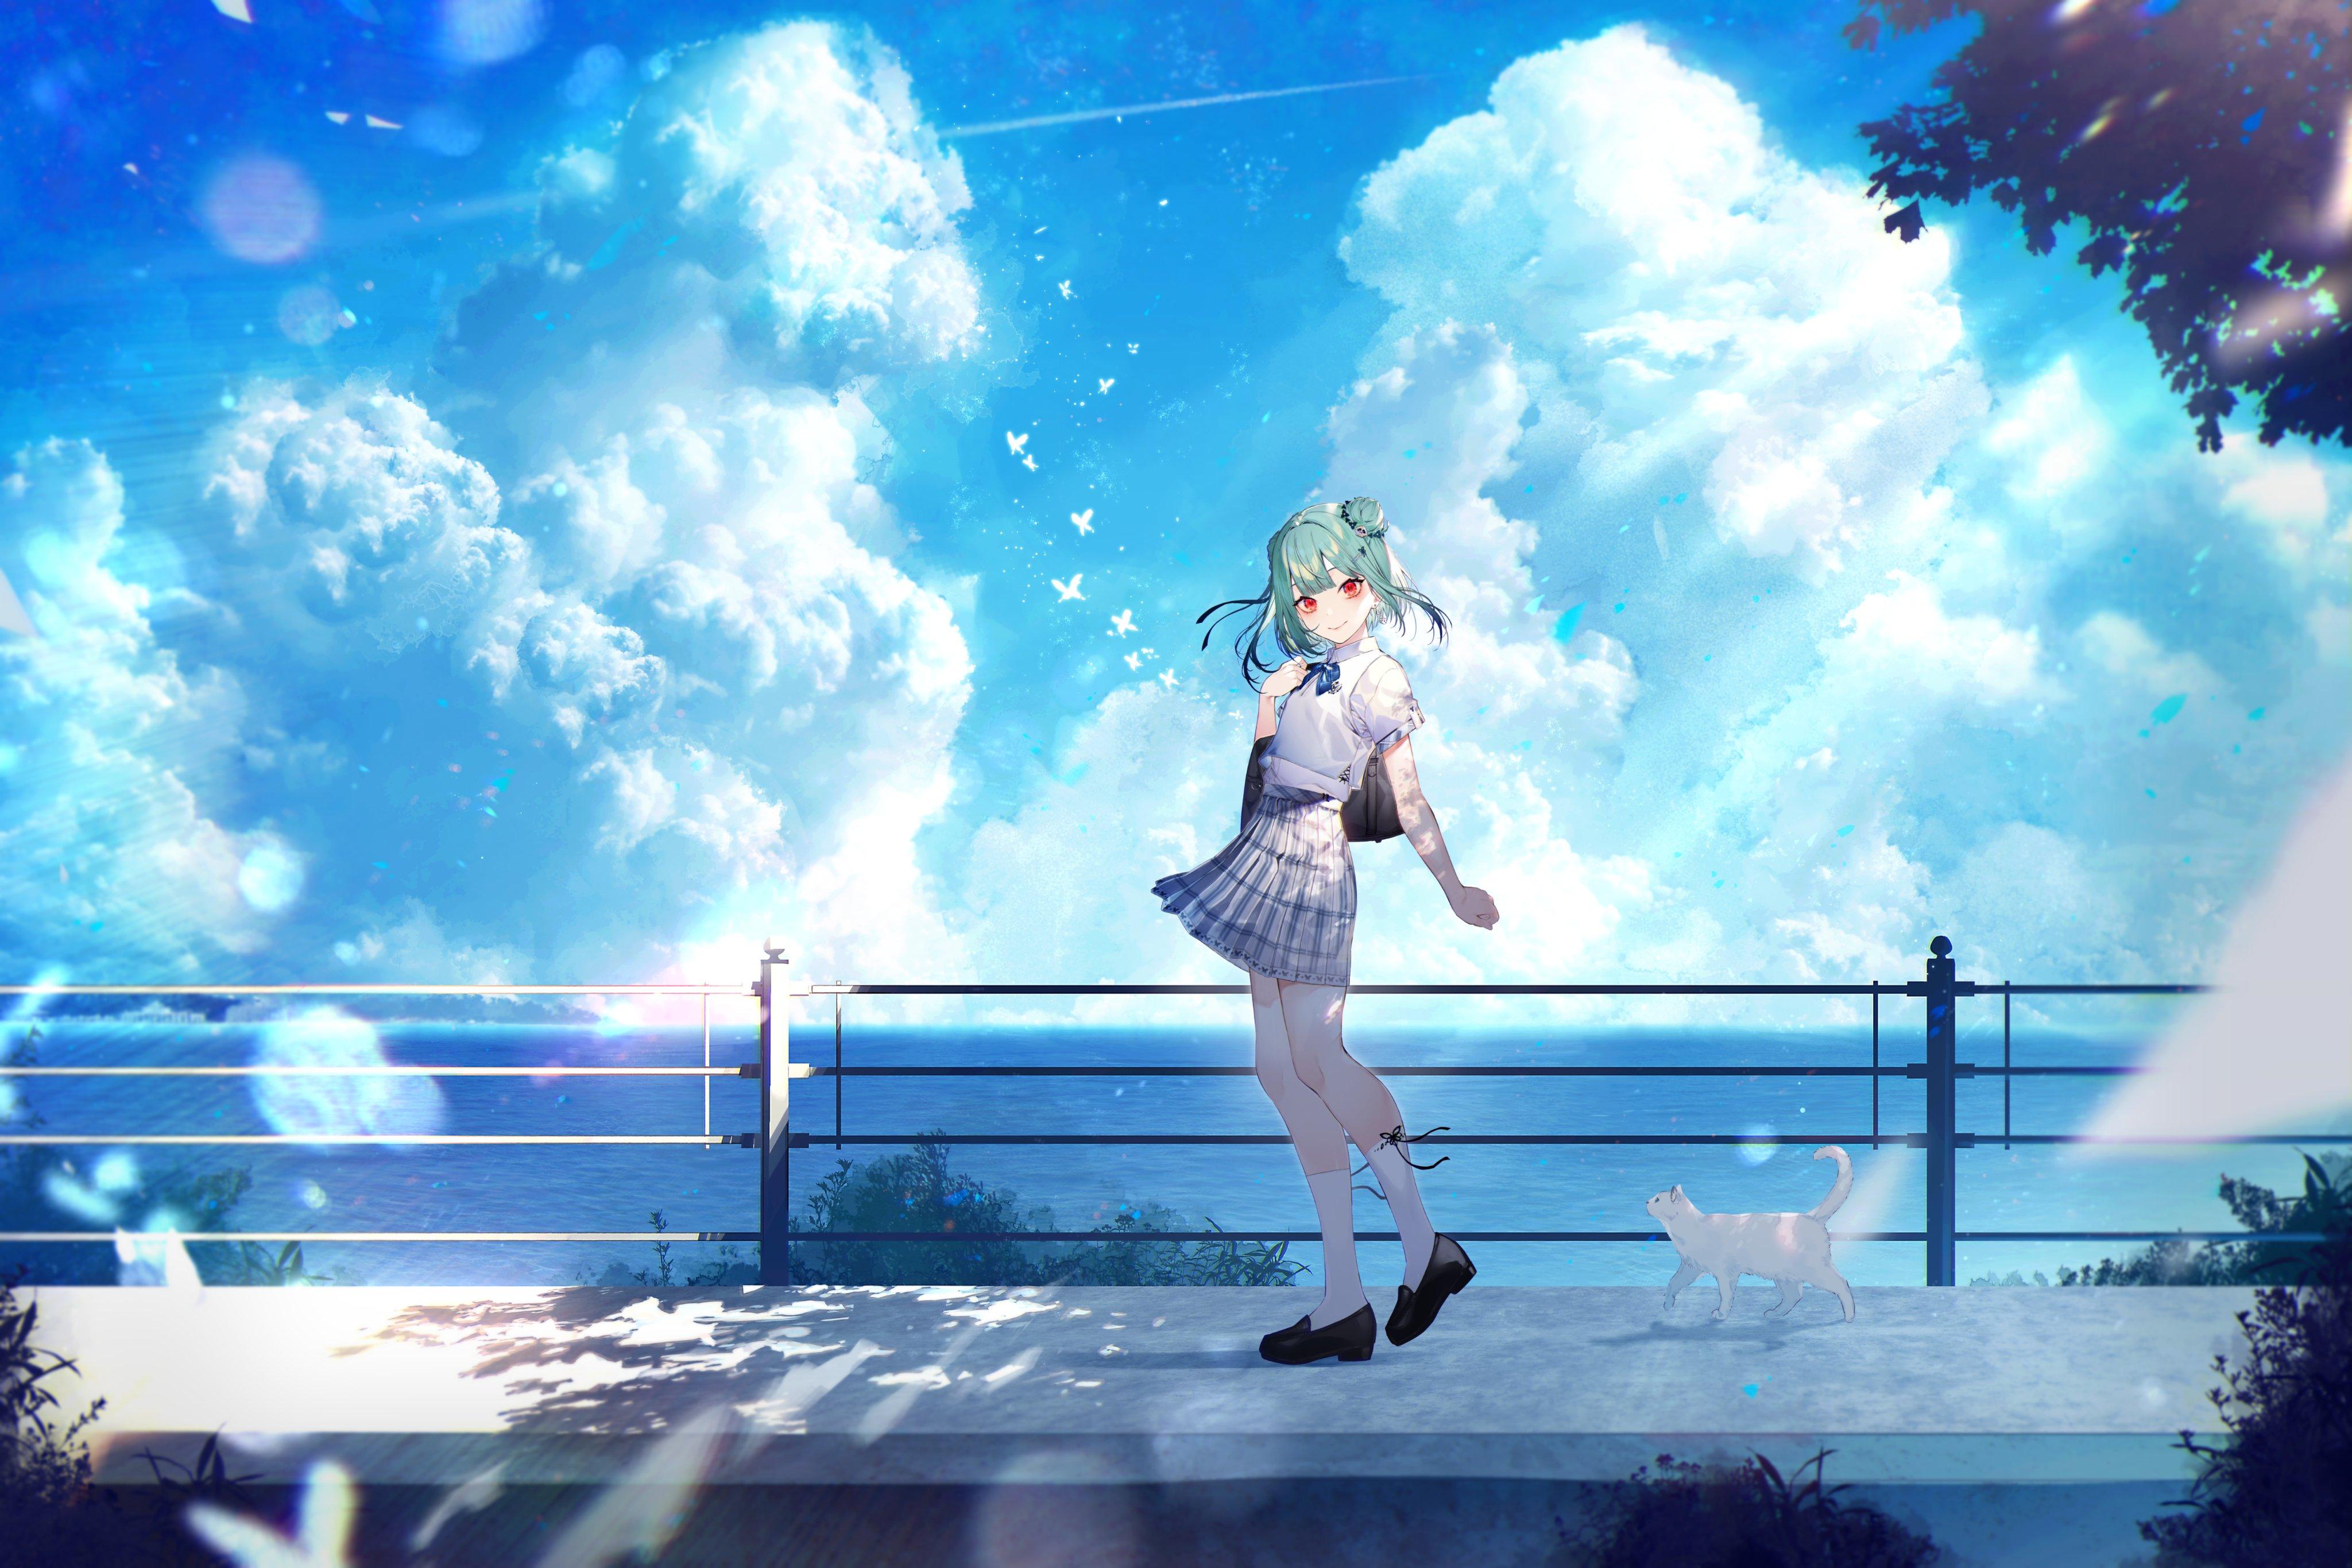 Anime 4096x2731 anime anime girls Uruha Rushia Hololive fan art Kayahara Virtual Youtuber cats green hair red eyes pale school uniform sky clouds